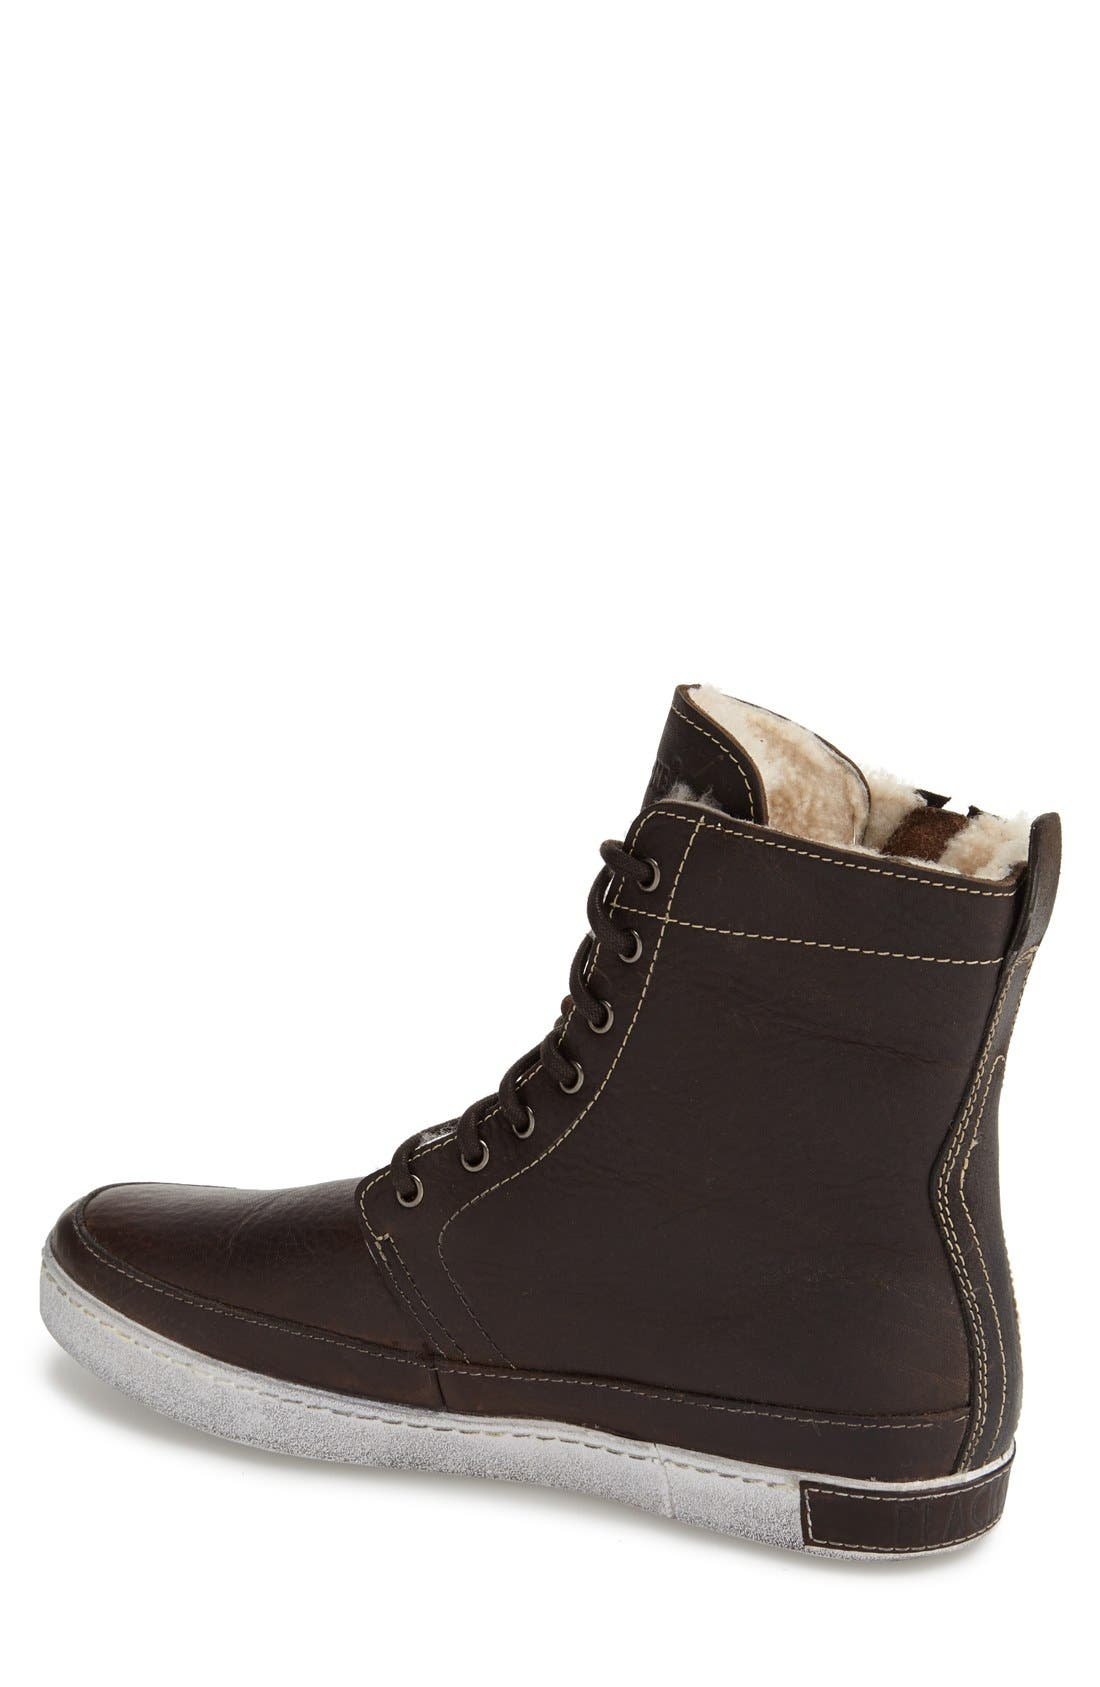 'GM05' High Top Sneaker,                             Alternate thumbnail 2, color,                             207